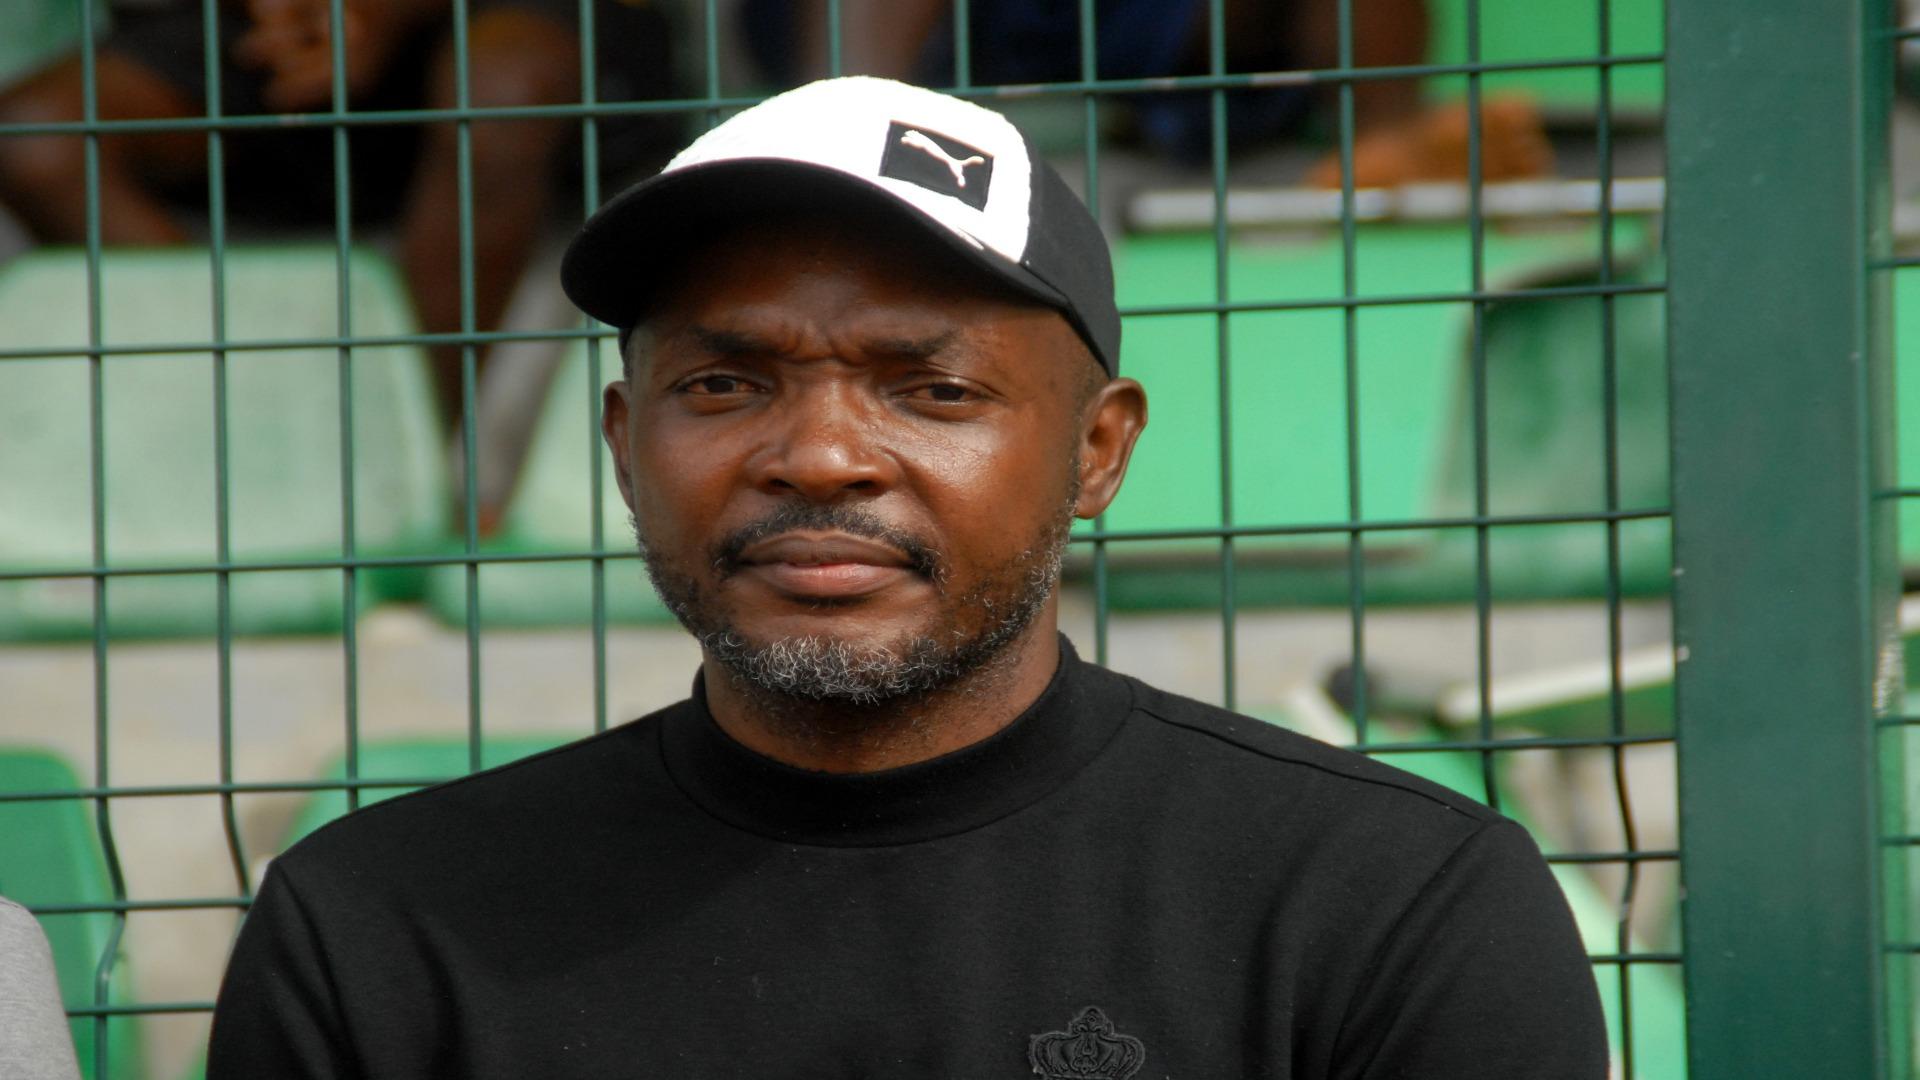 Kwara united ready for NPFL favourite Enyimba – Biffo